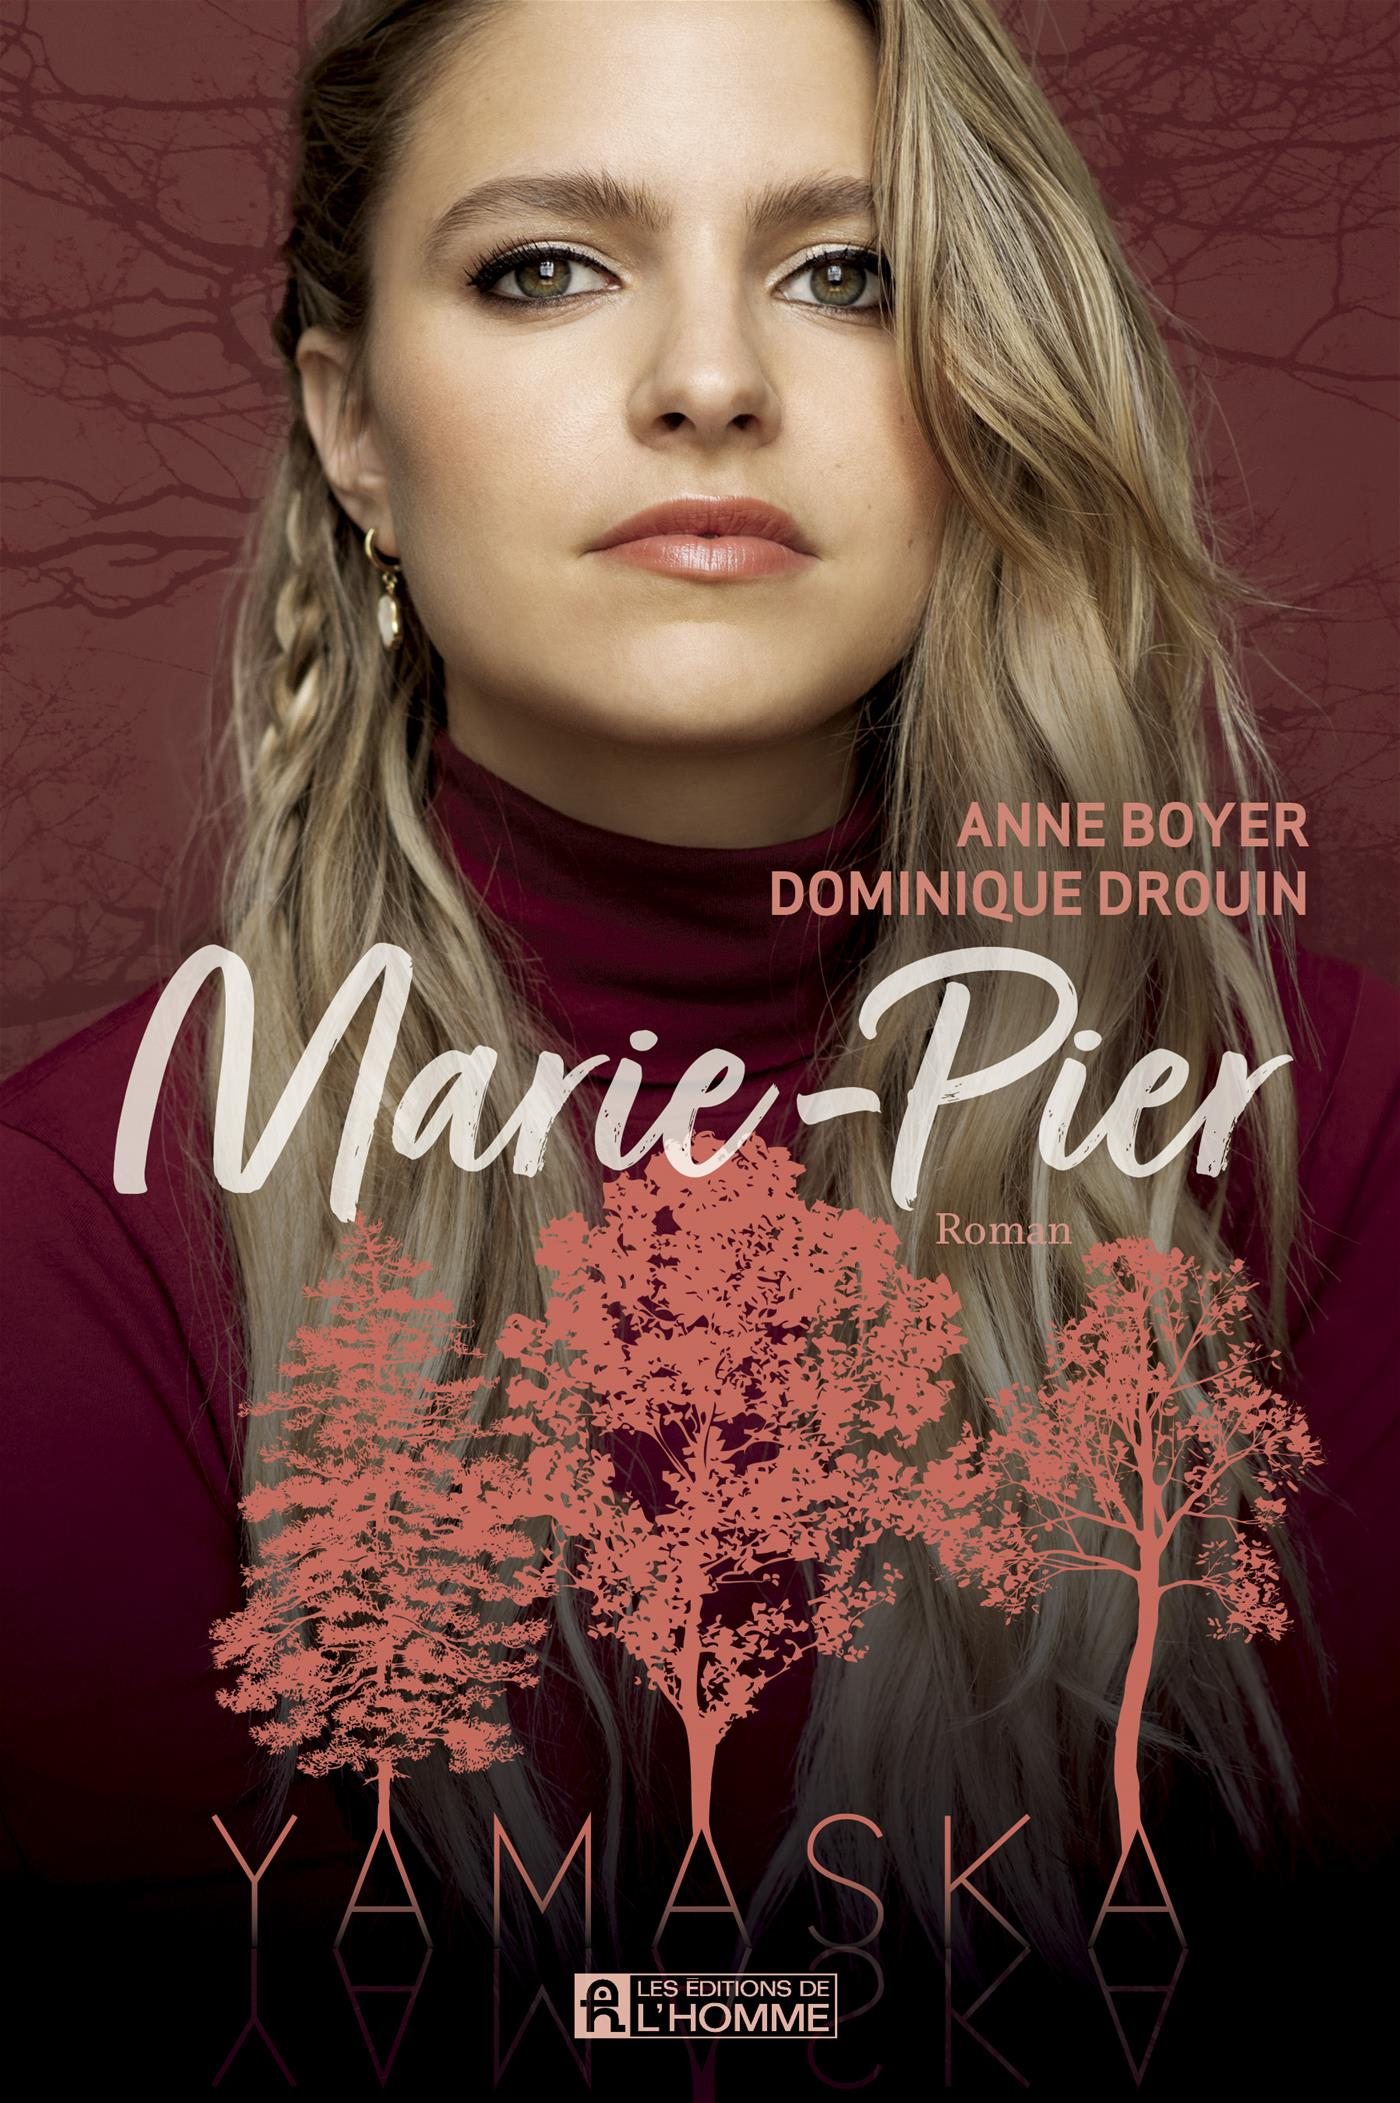 Marie-Pier